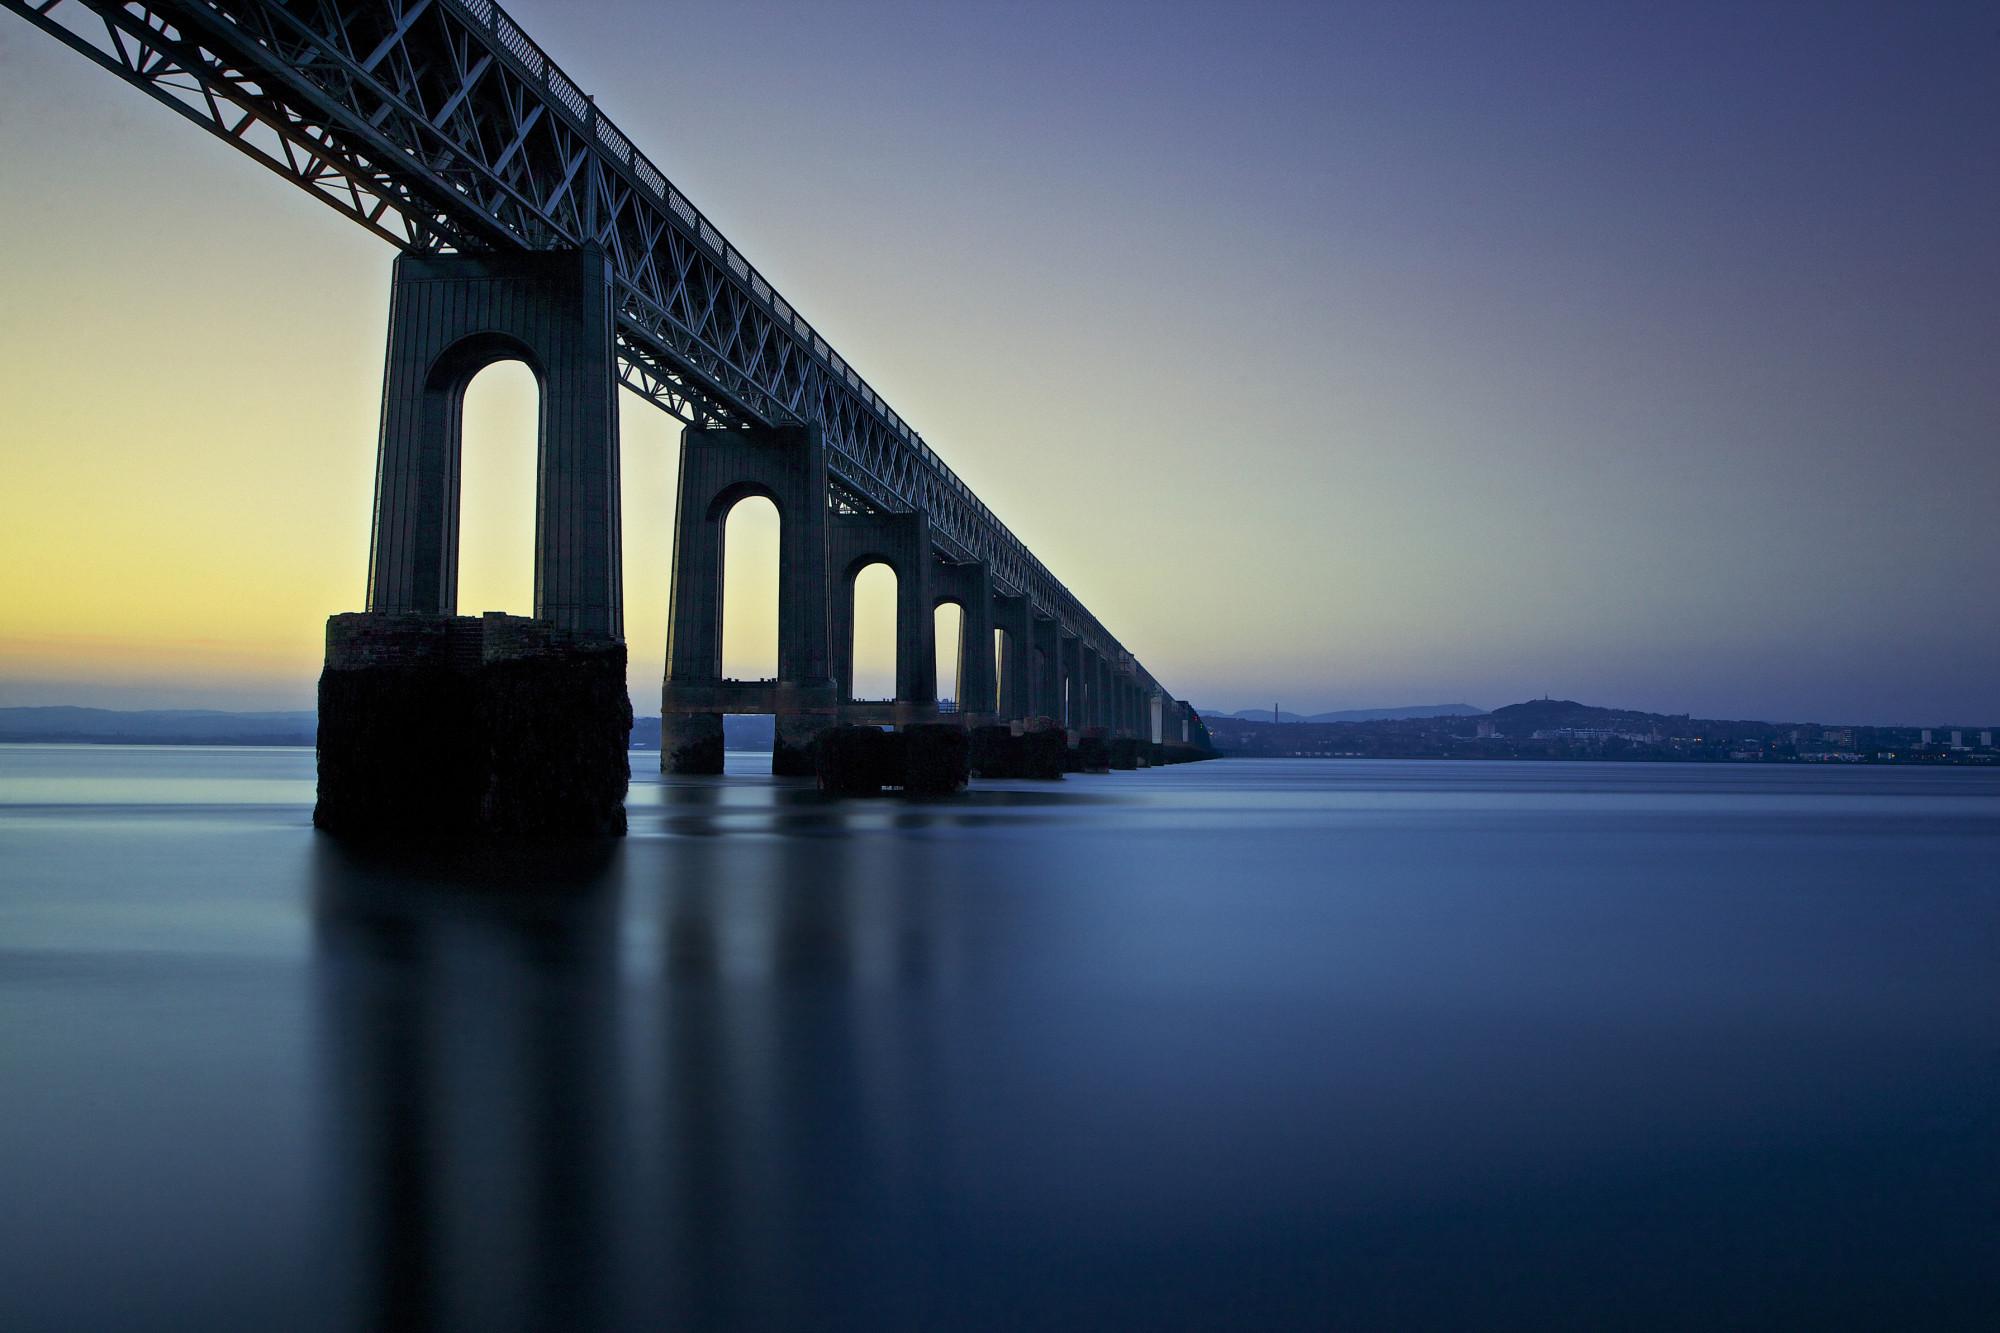 Tay Rail Bridge at Sunset by Gordon Forbes